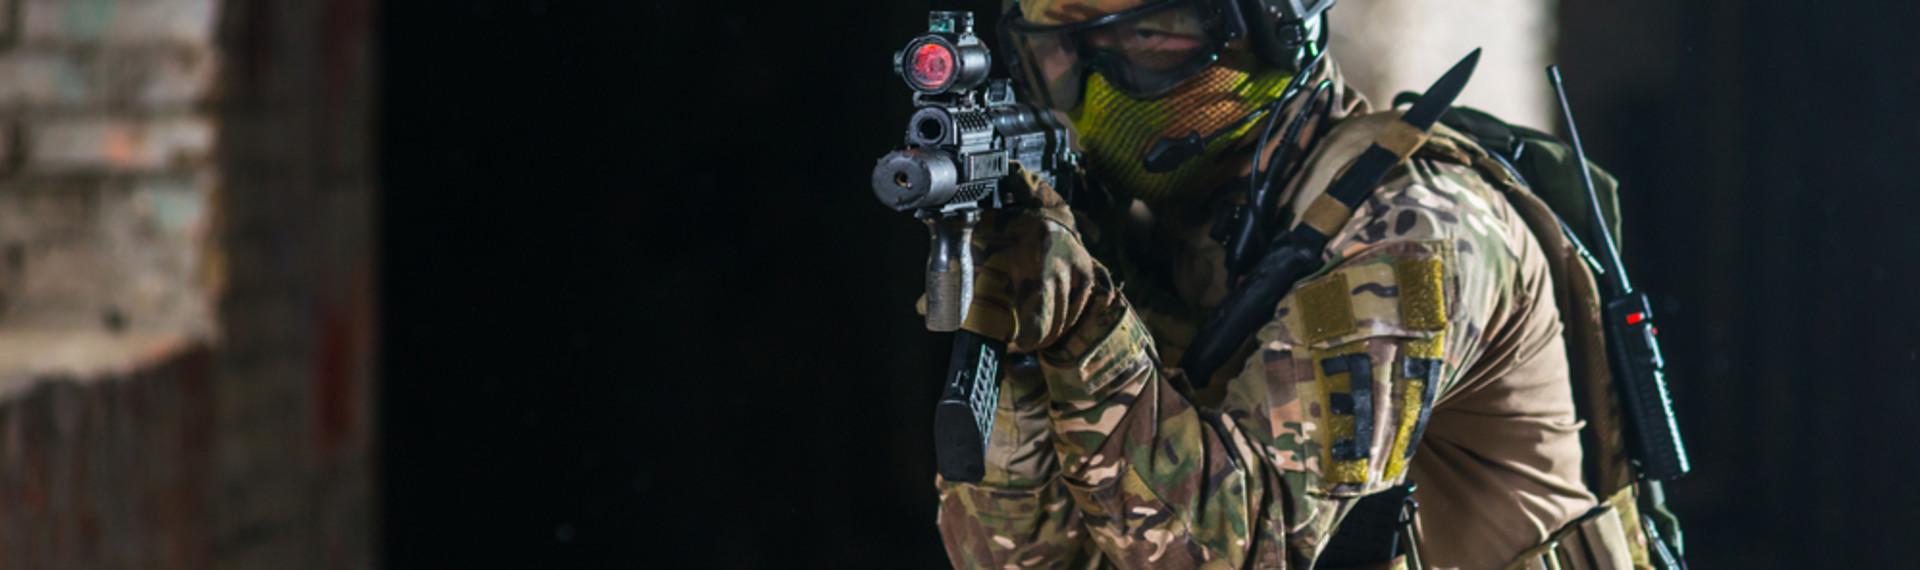 Budapest Assaut à l'airsoft image